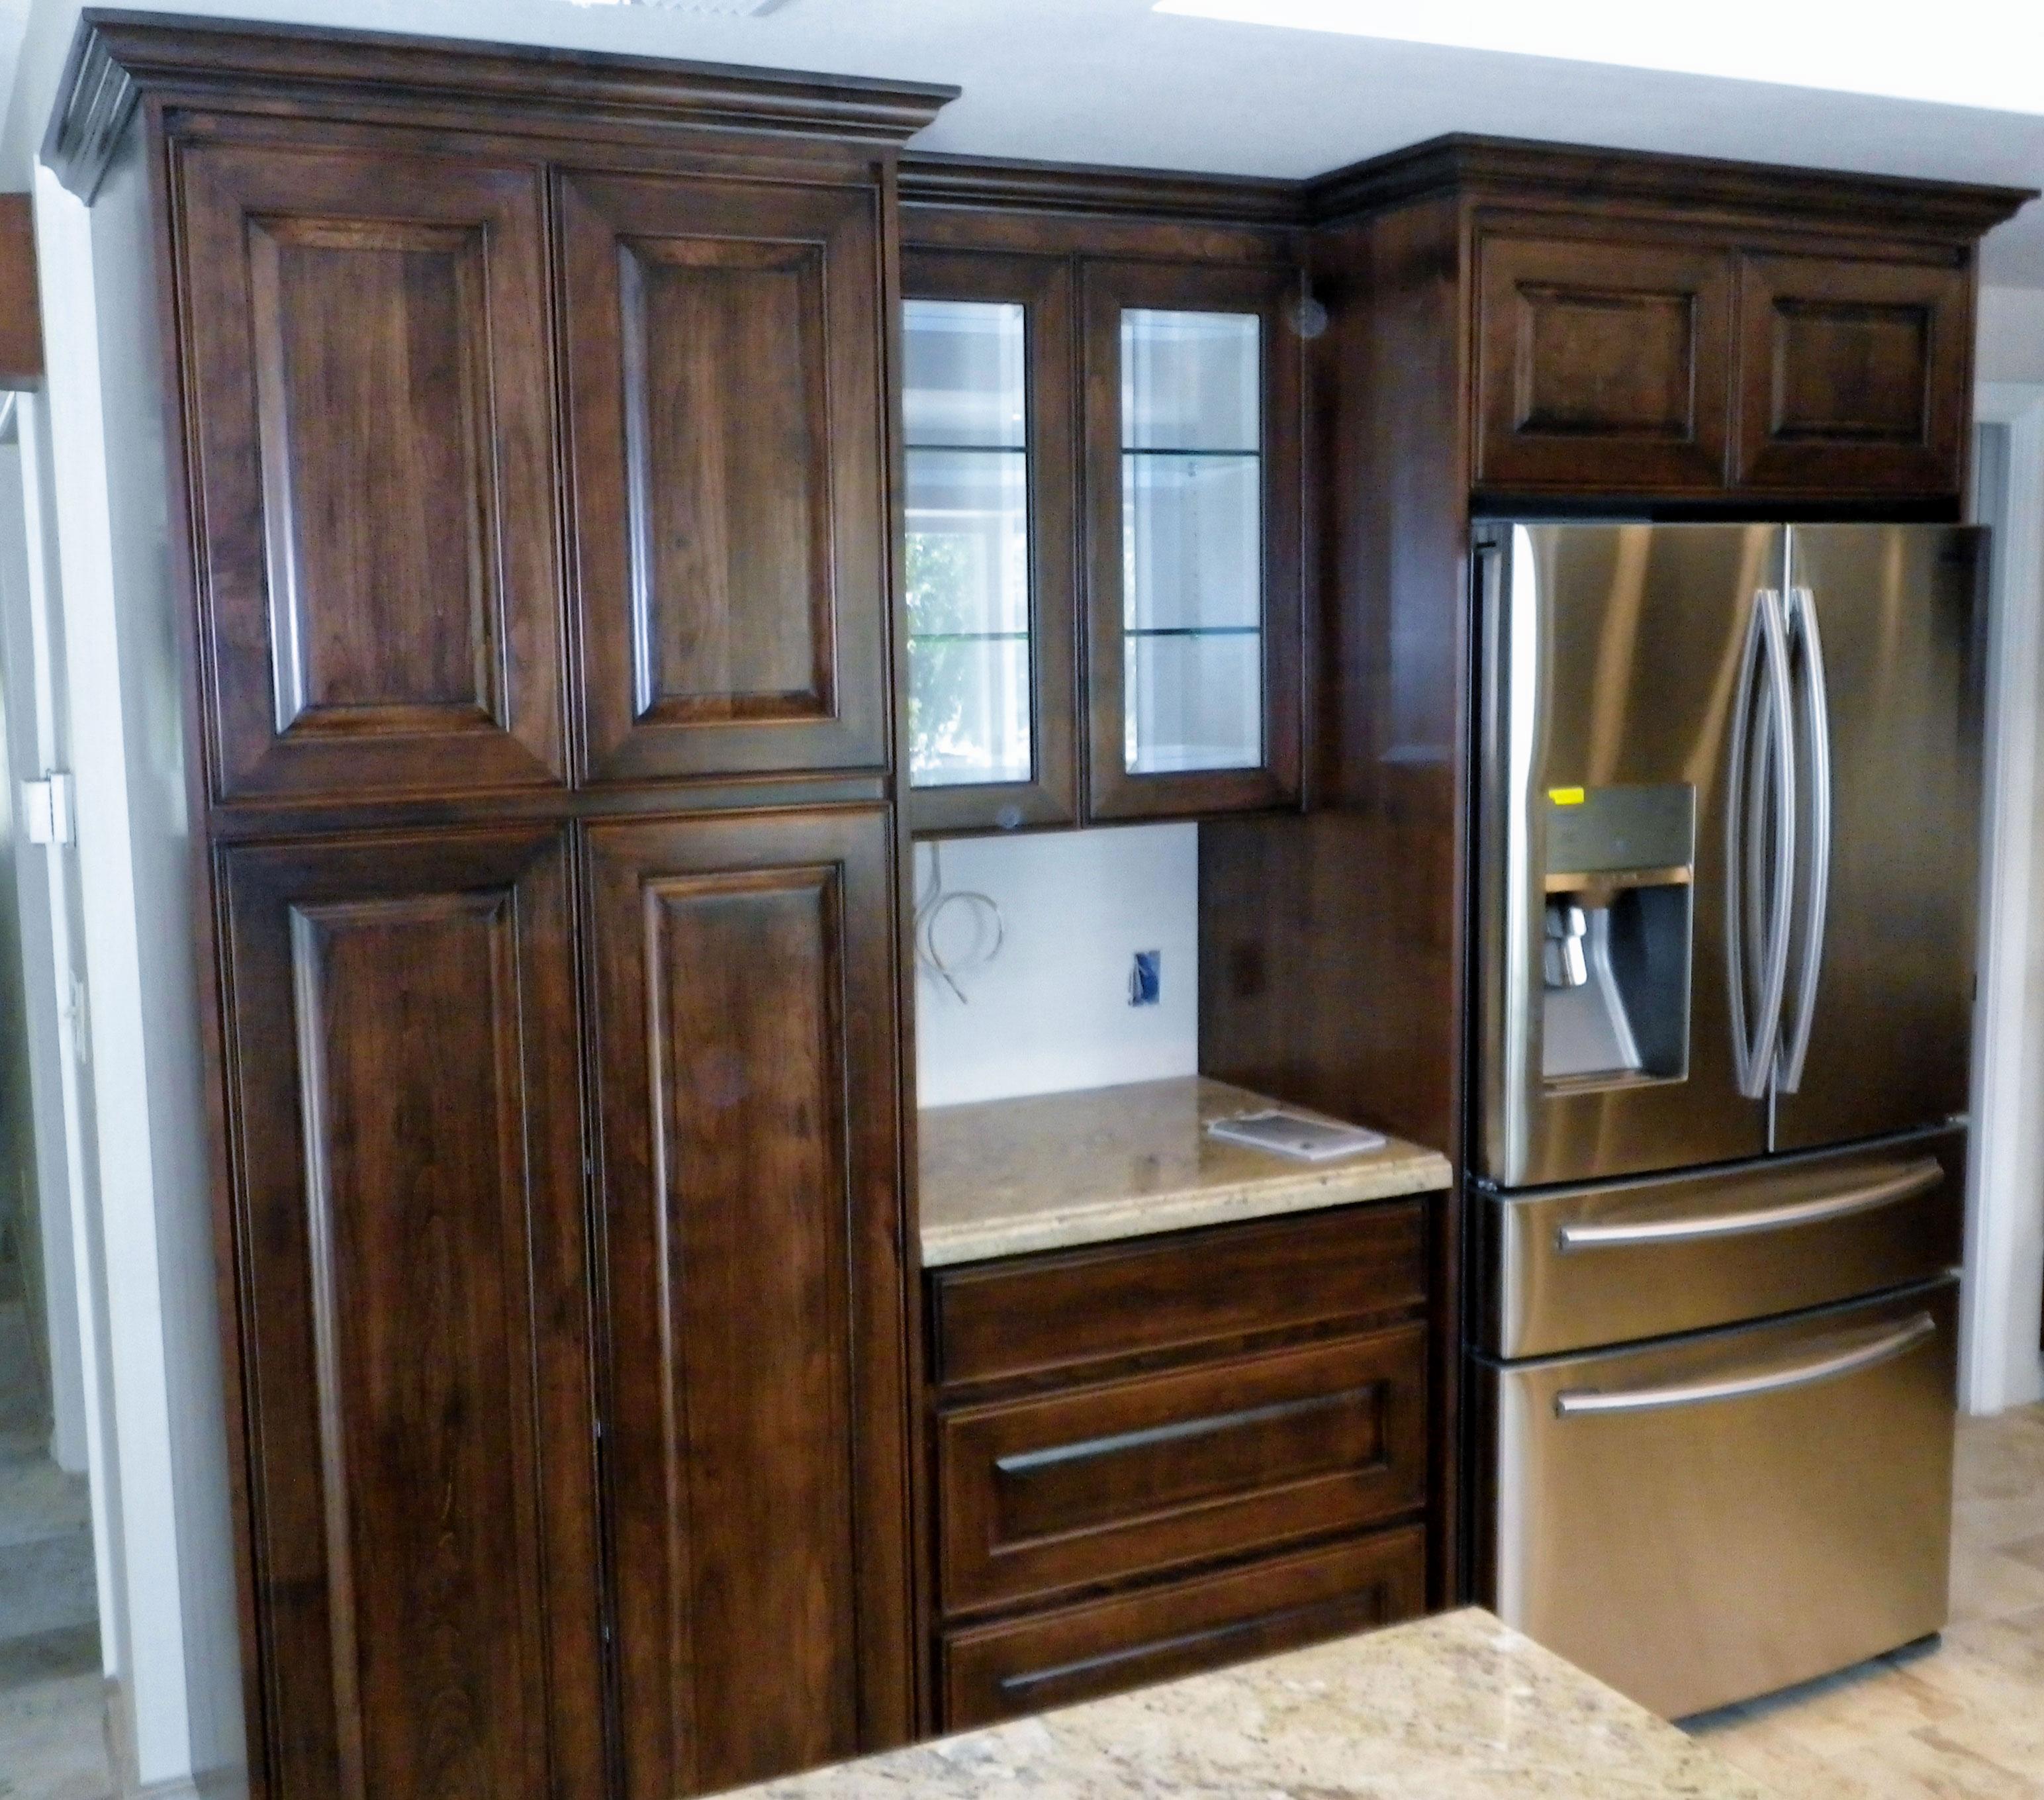 Kitchen Cabinets Inc: Kehöe Custom Wood Designs, Inc. Custom Cabinet Makers